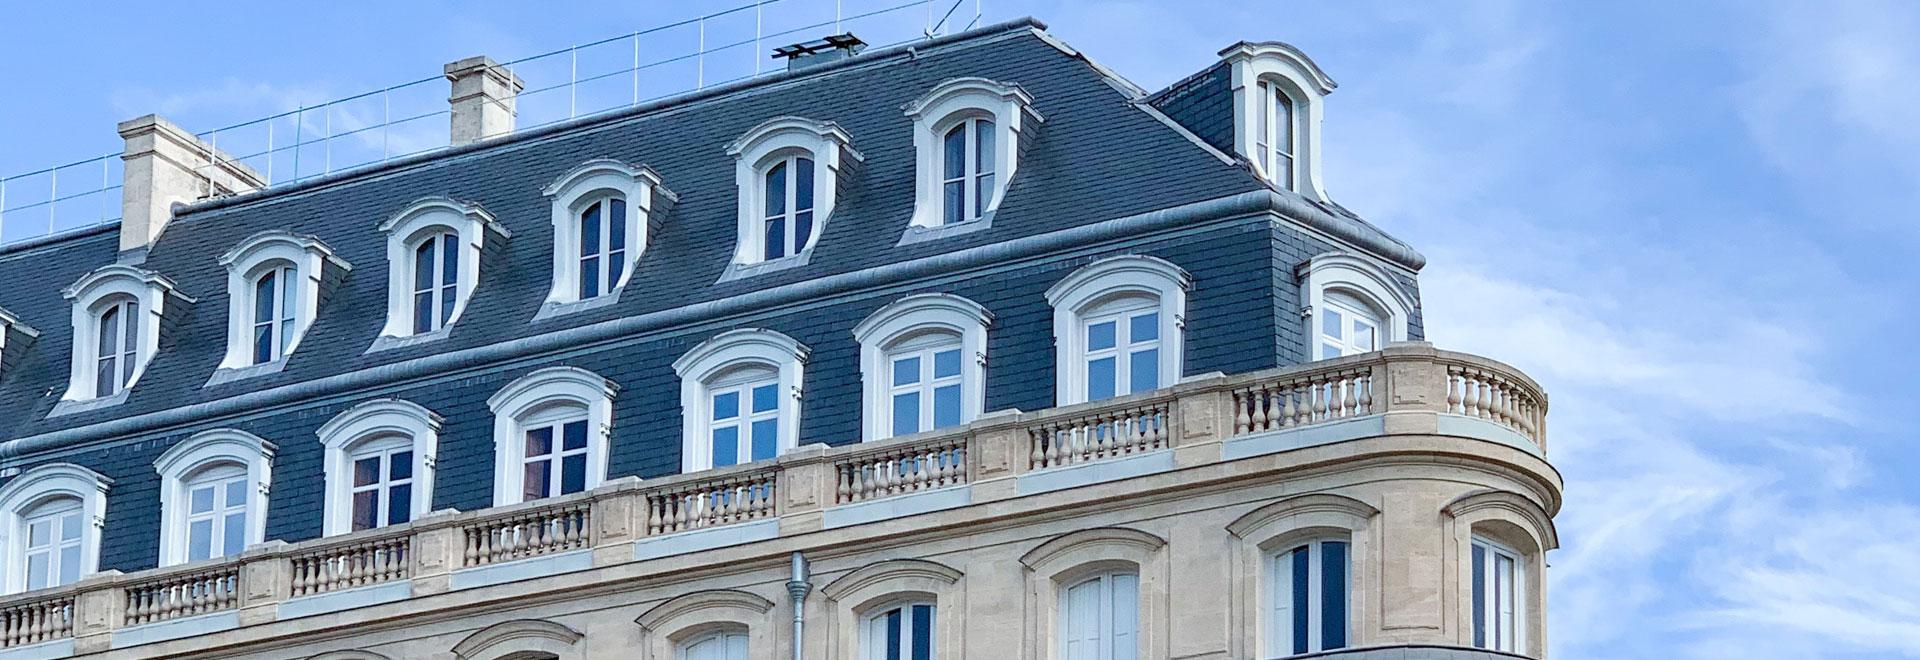 aiac-assurances-immeuble-syndic